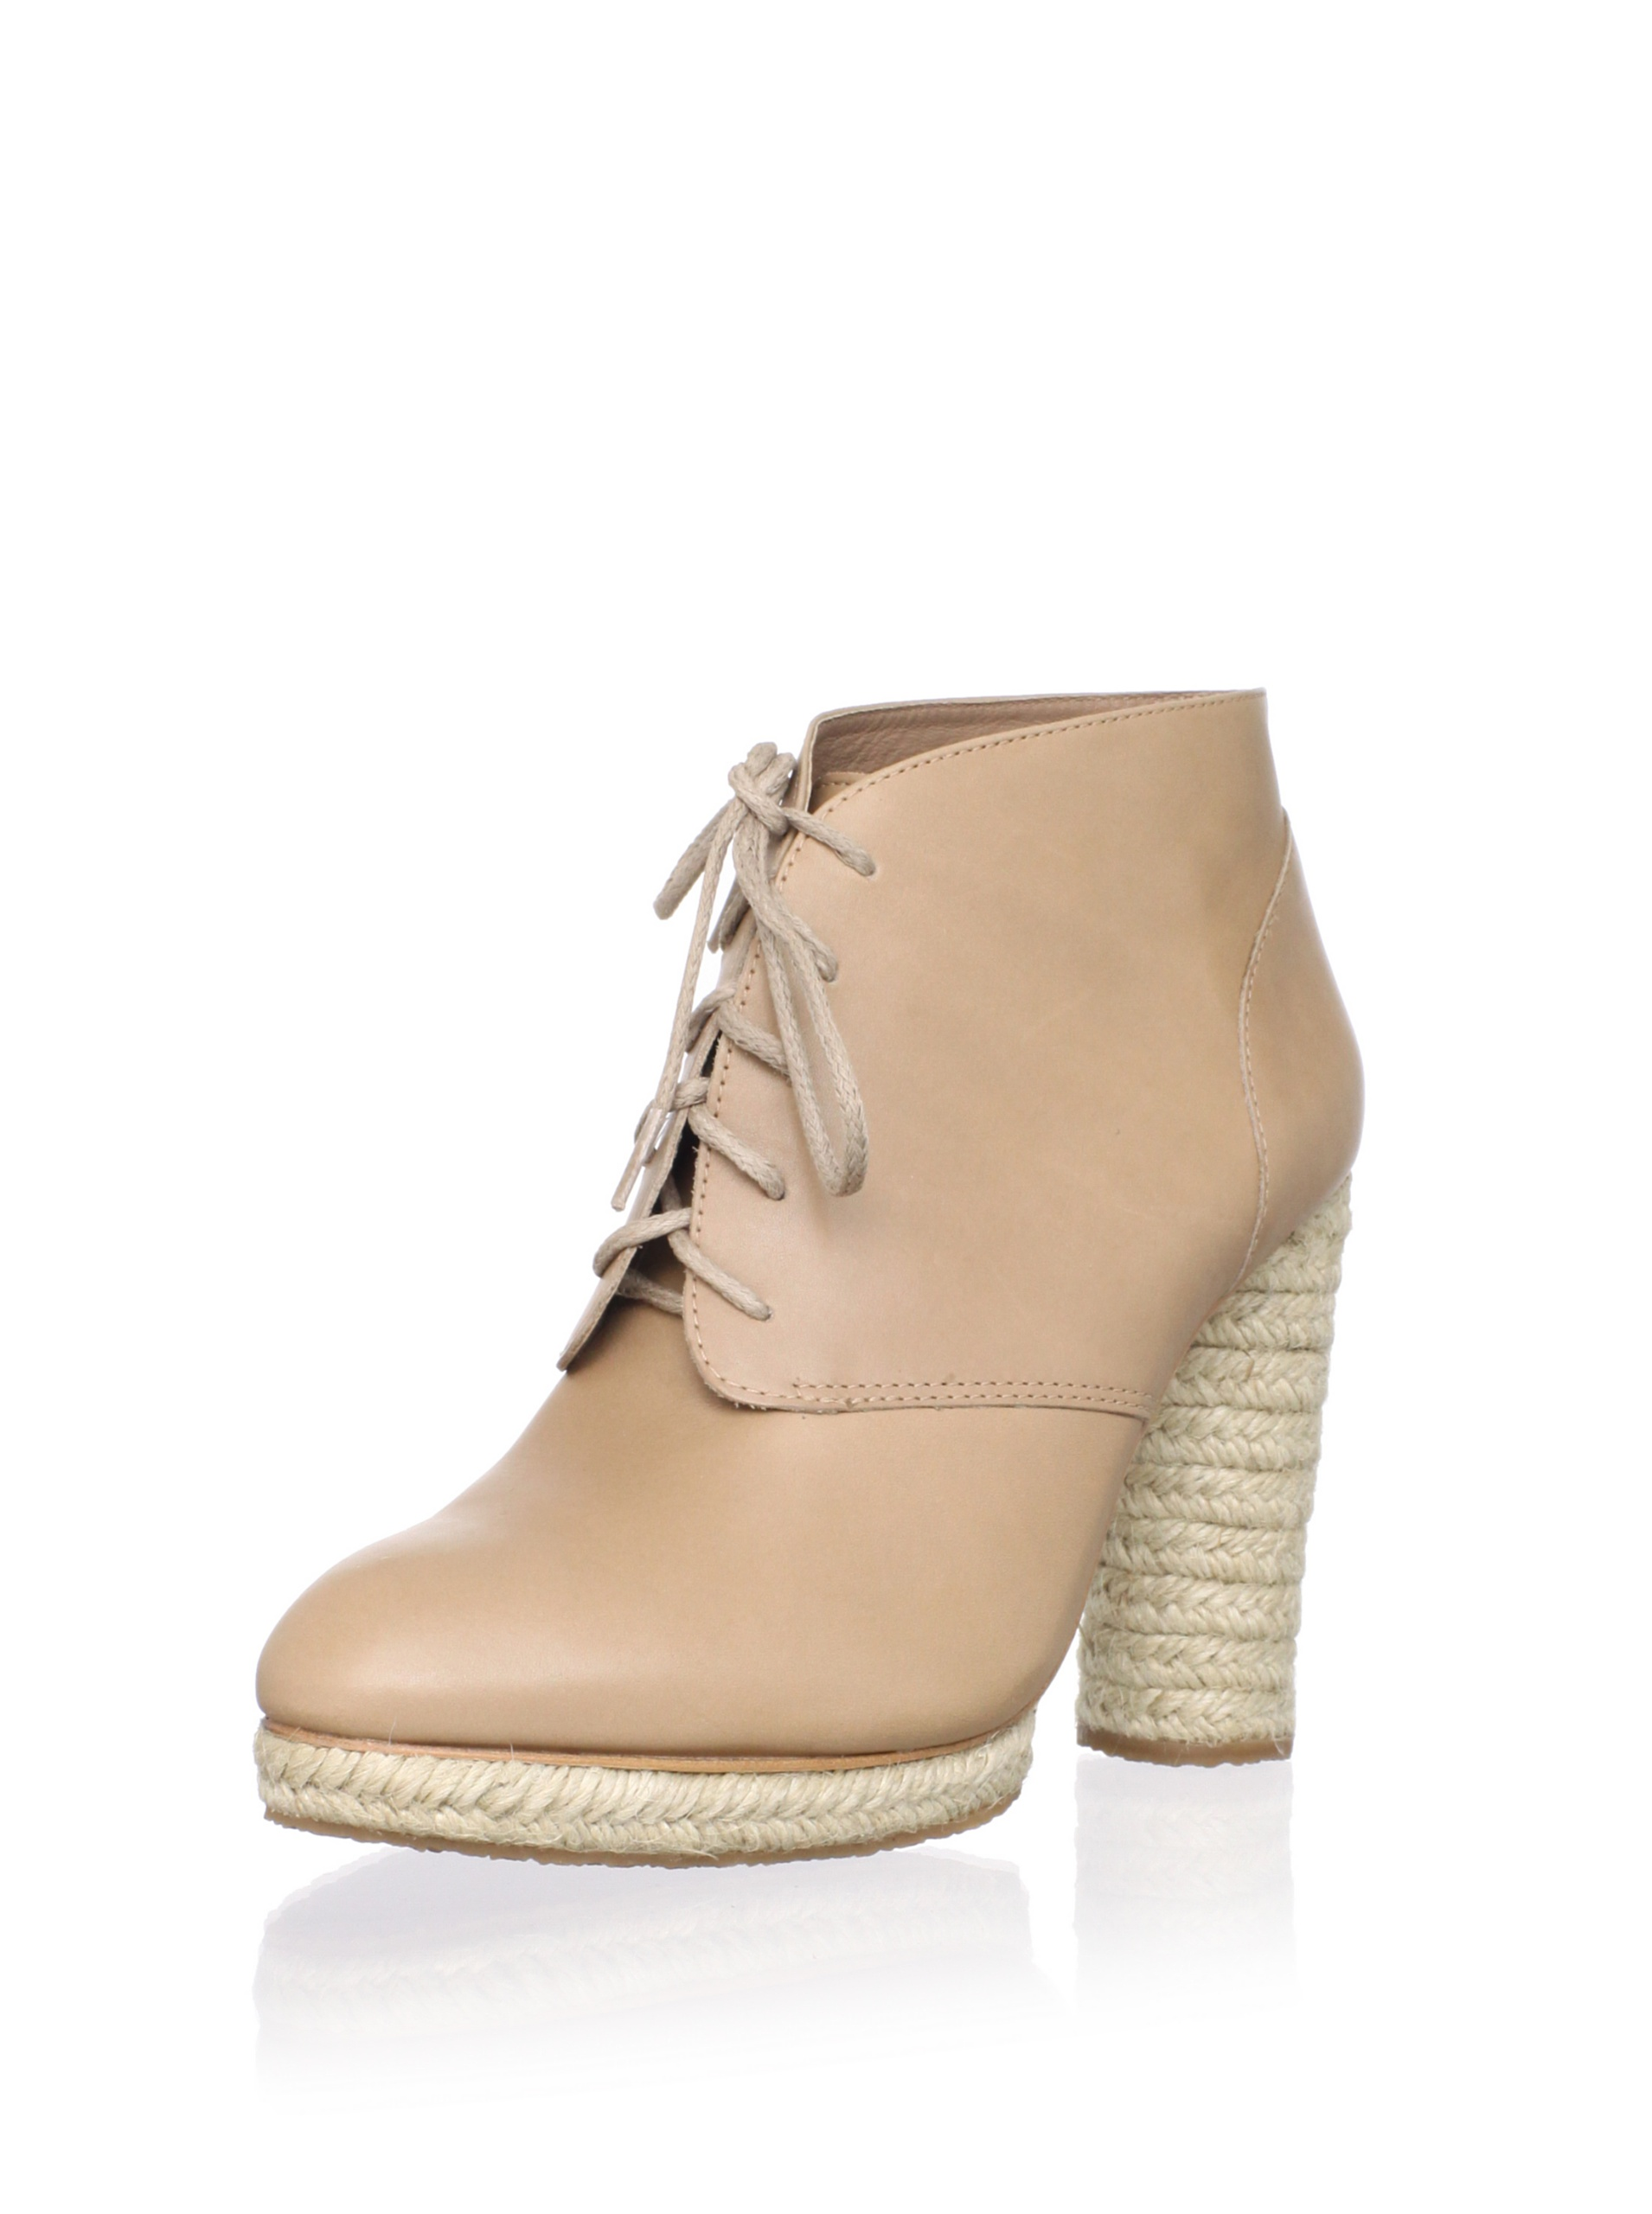 Loeffler Randall Women's Nadia Espadrille Ankle Boot (Tortora)